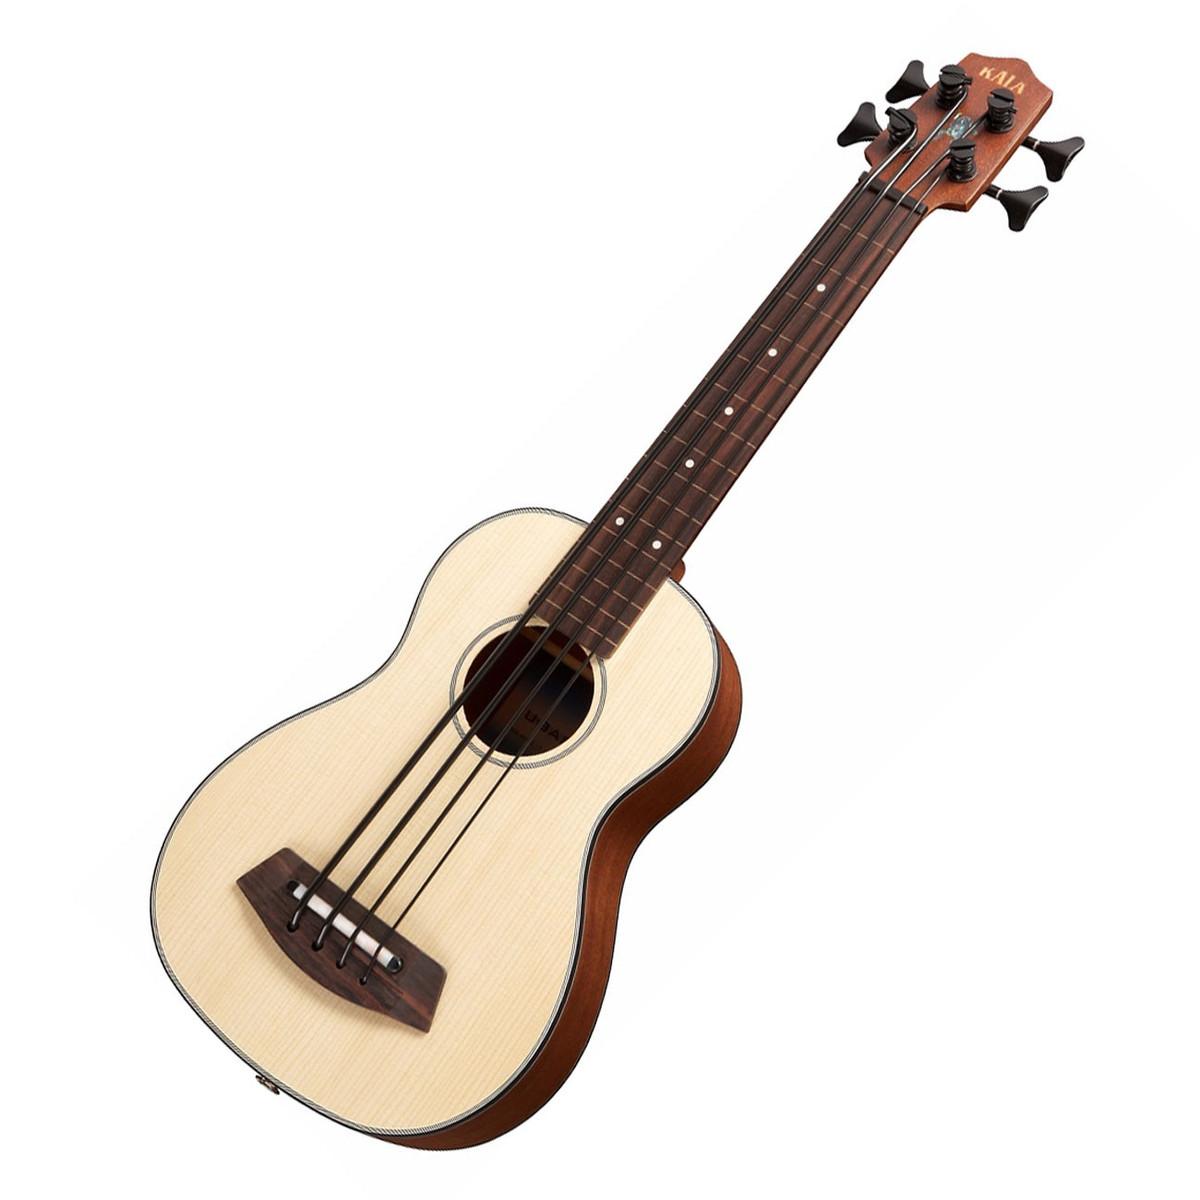 kala u bass ssmhg fl electro acoustic bass ukulele fretless at gear4music. Black Bedroom Furniture Sets. Home Design Ideas